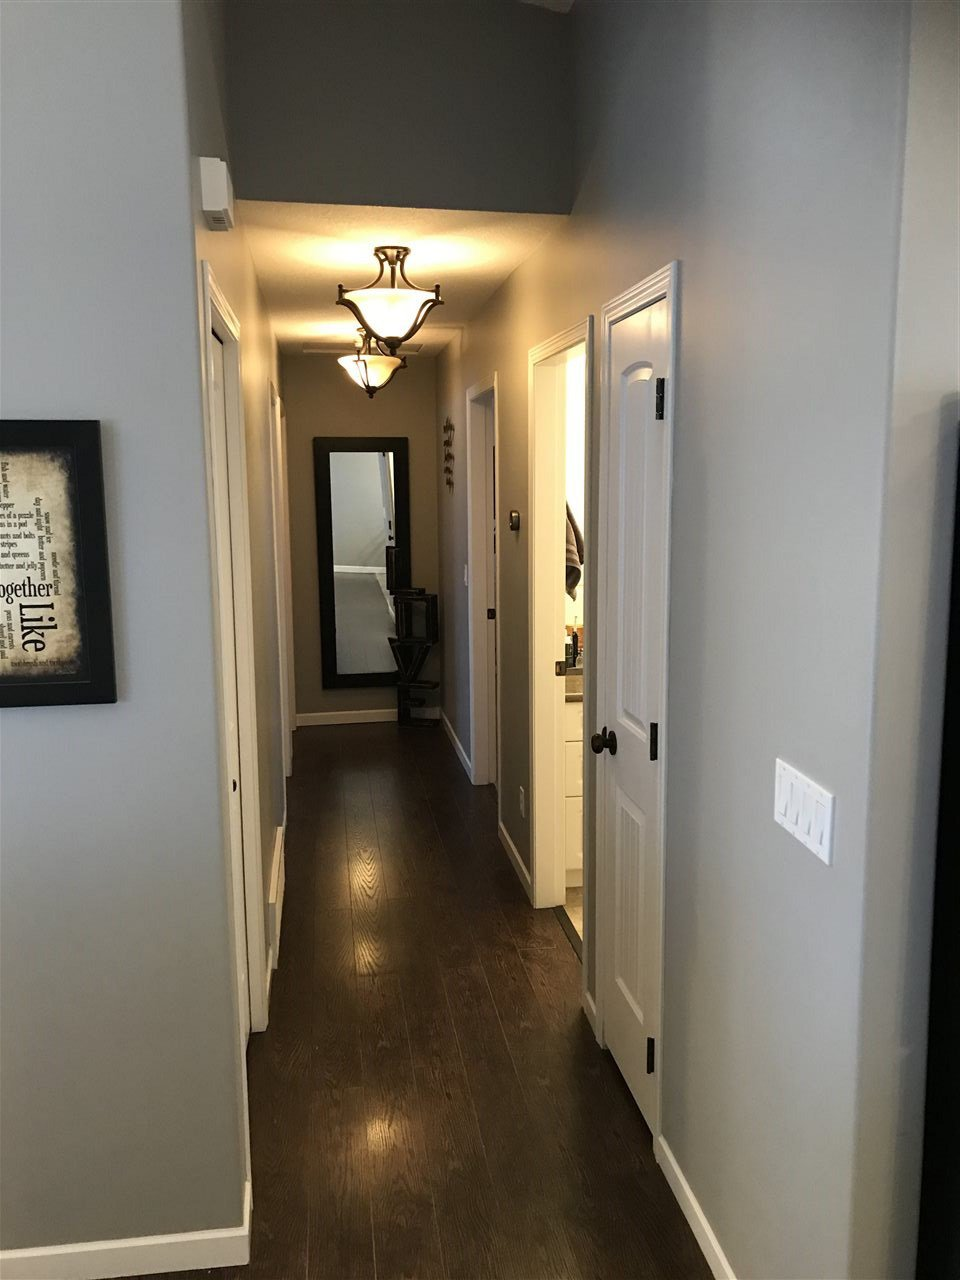 "Photo 7: Photos: 8724 114 Avenue in Fort St. John: Fort St. John - City NE House for sale in ""PANORAMA RIDGE"" (Fort St. John (Zone 60))  : MLS®# R2428633"